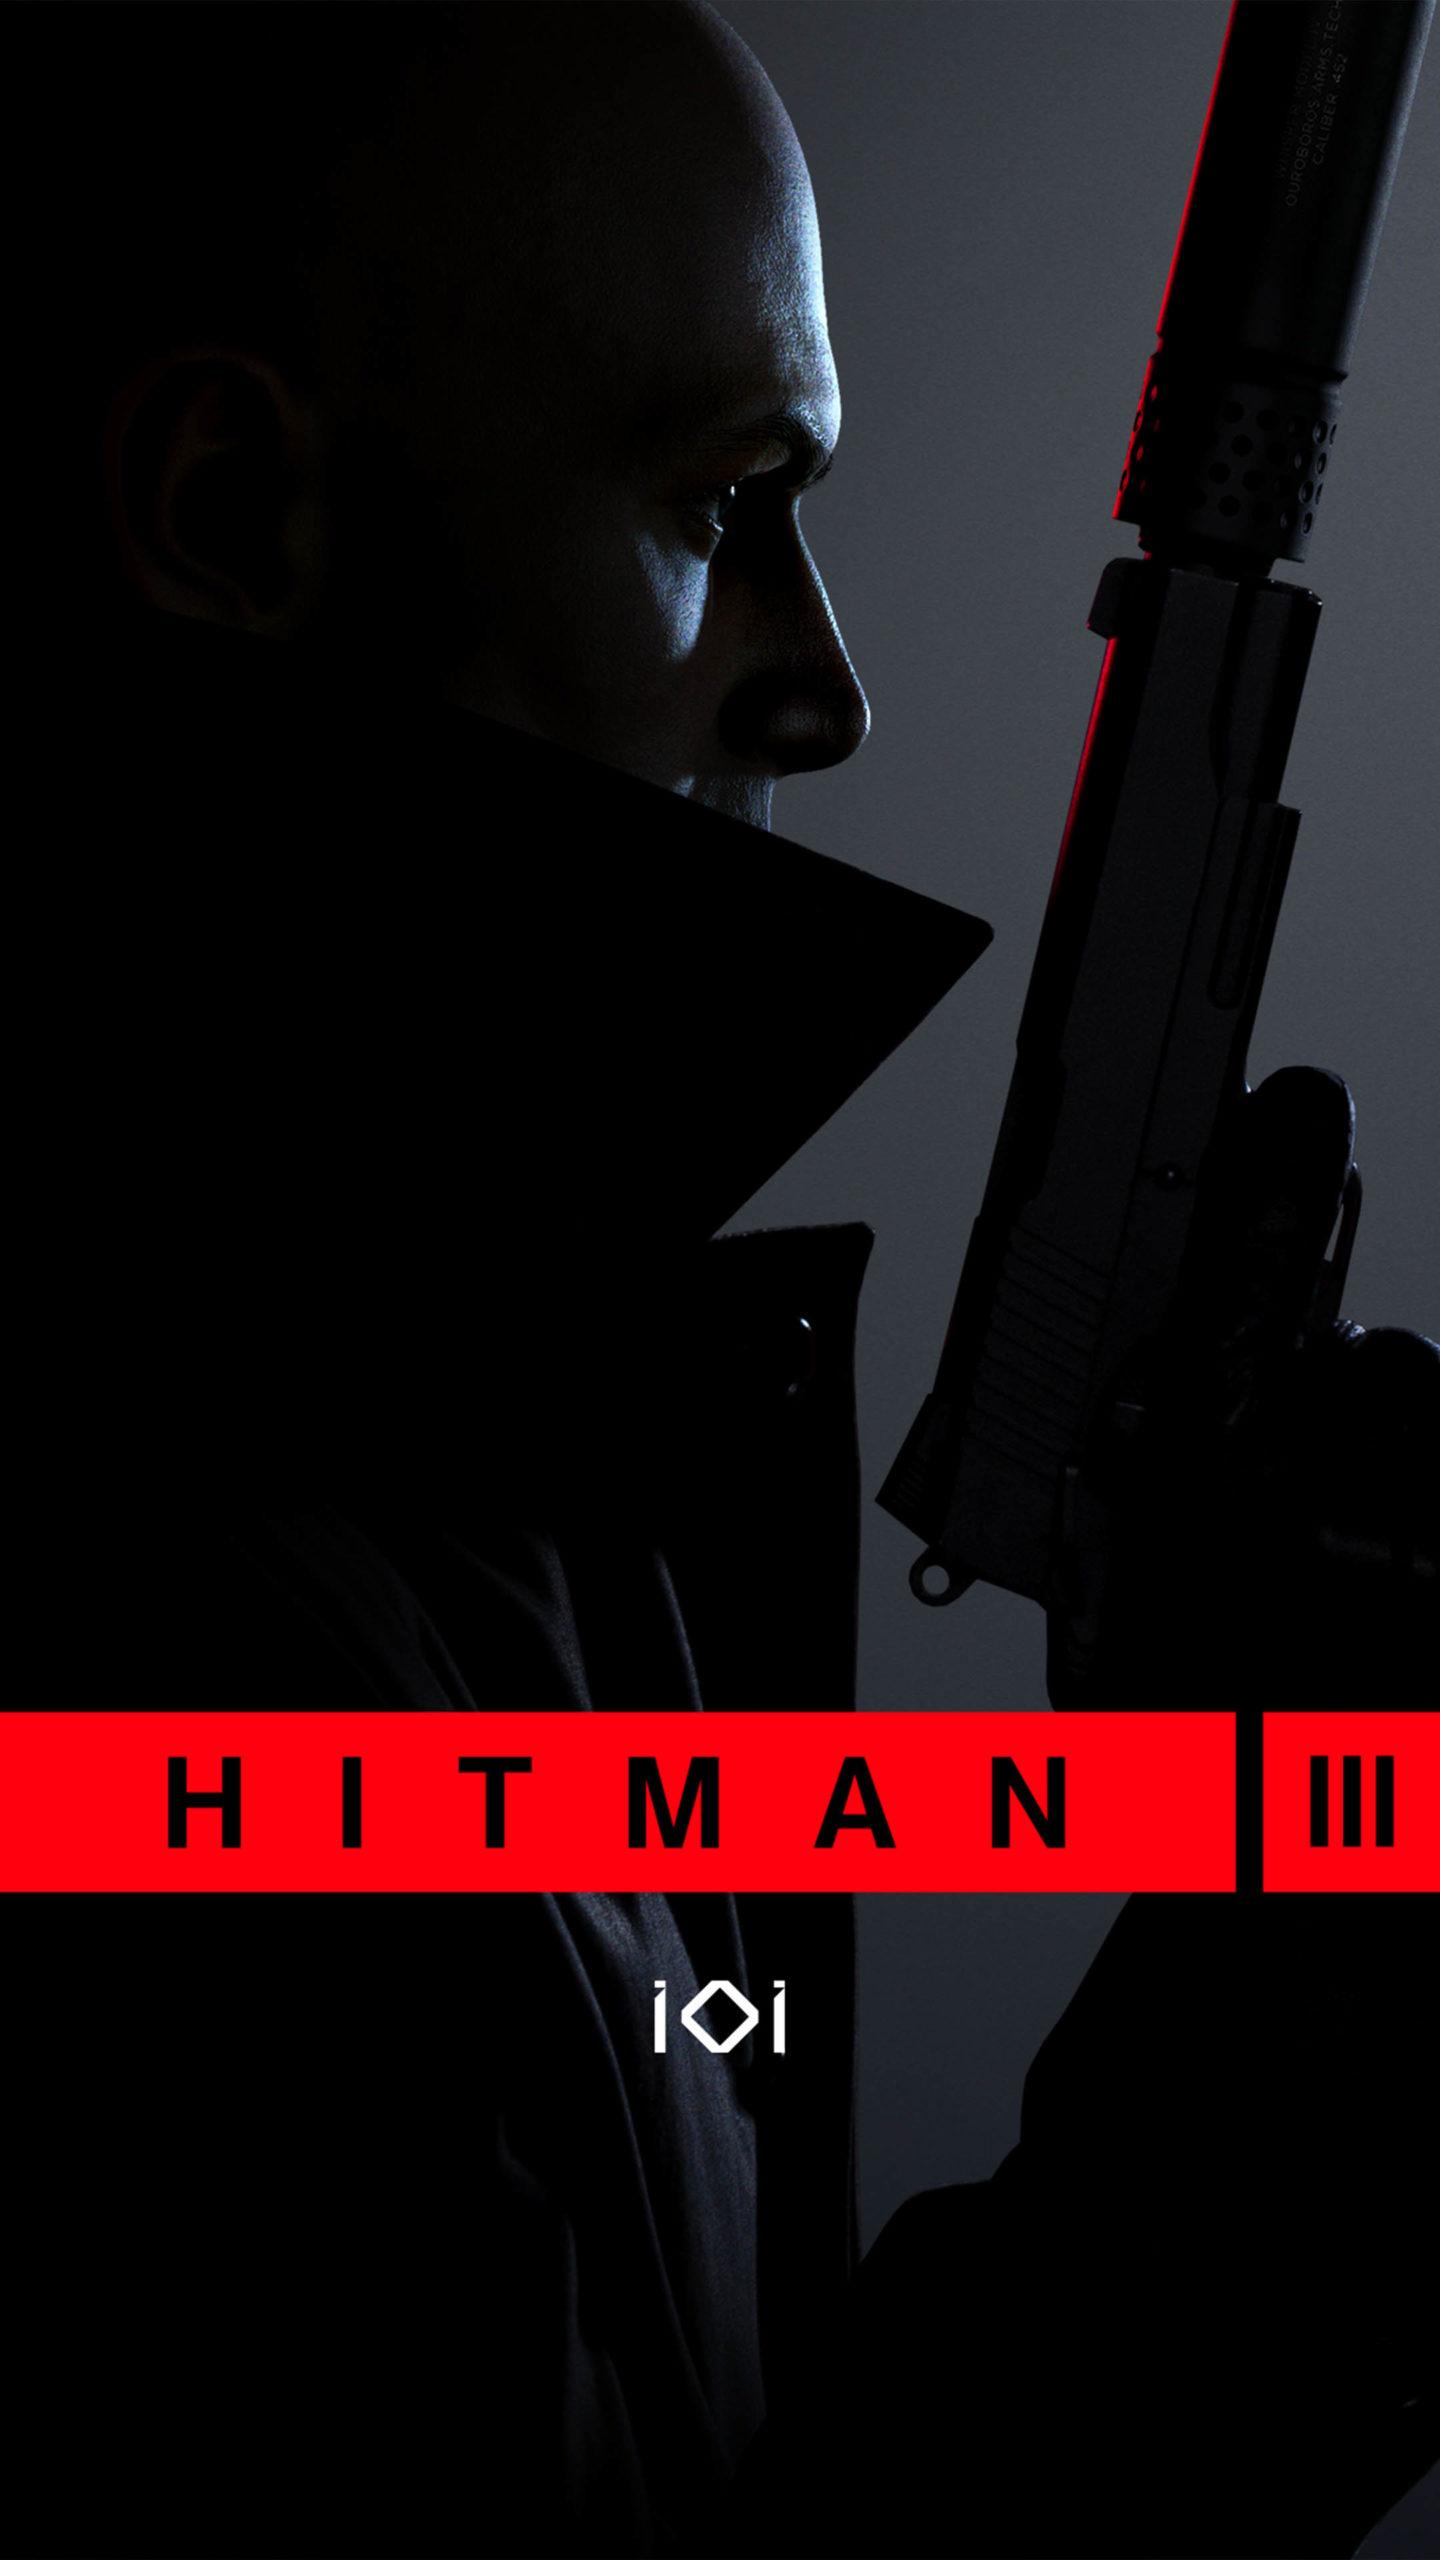 Hitman 3 Game Poster 4K Ultra HD Mobile Wallpaper